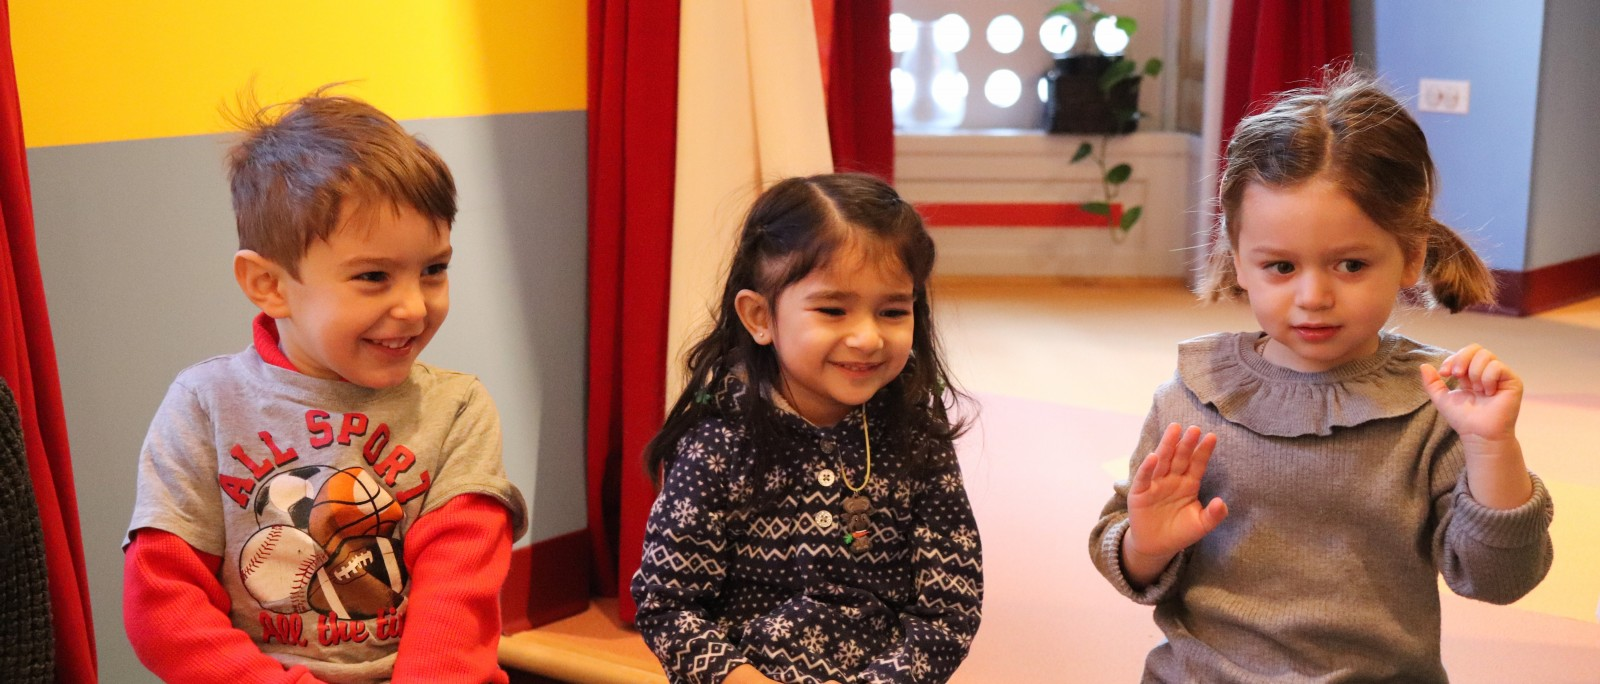 Alliance Francaise De Chicago Preschool Program